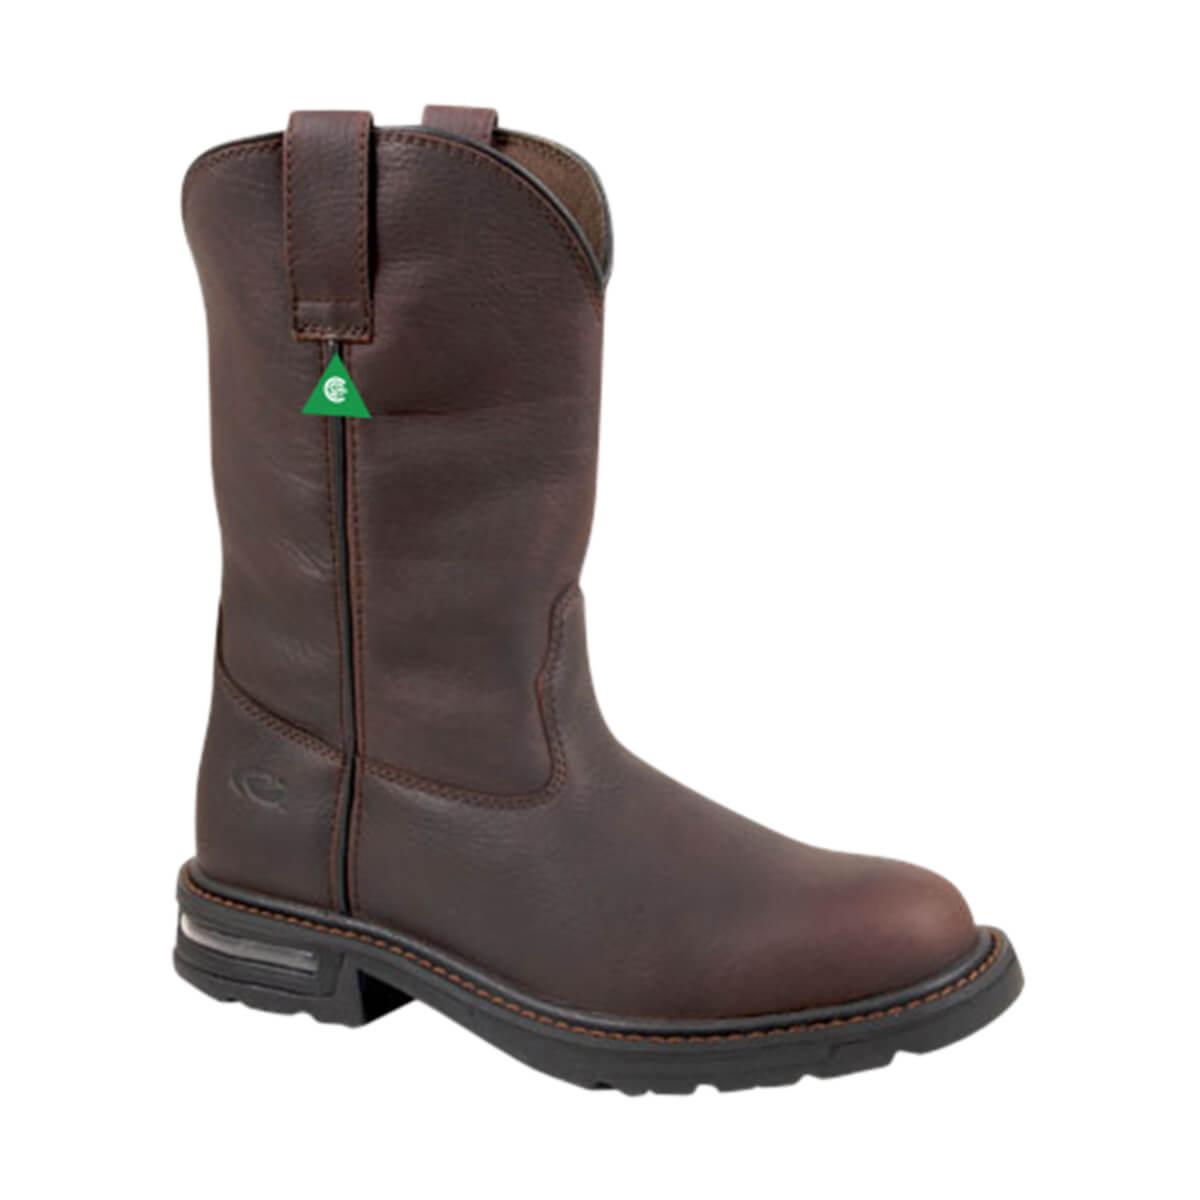 Cowboy Boot - Roper - Brown